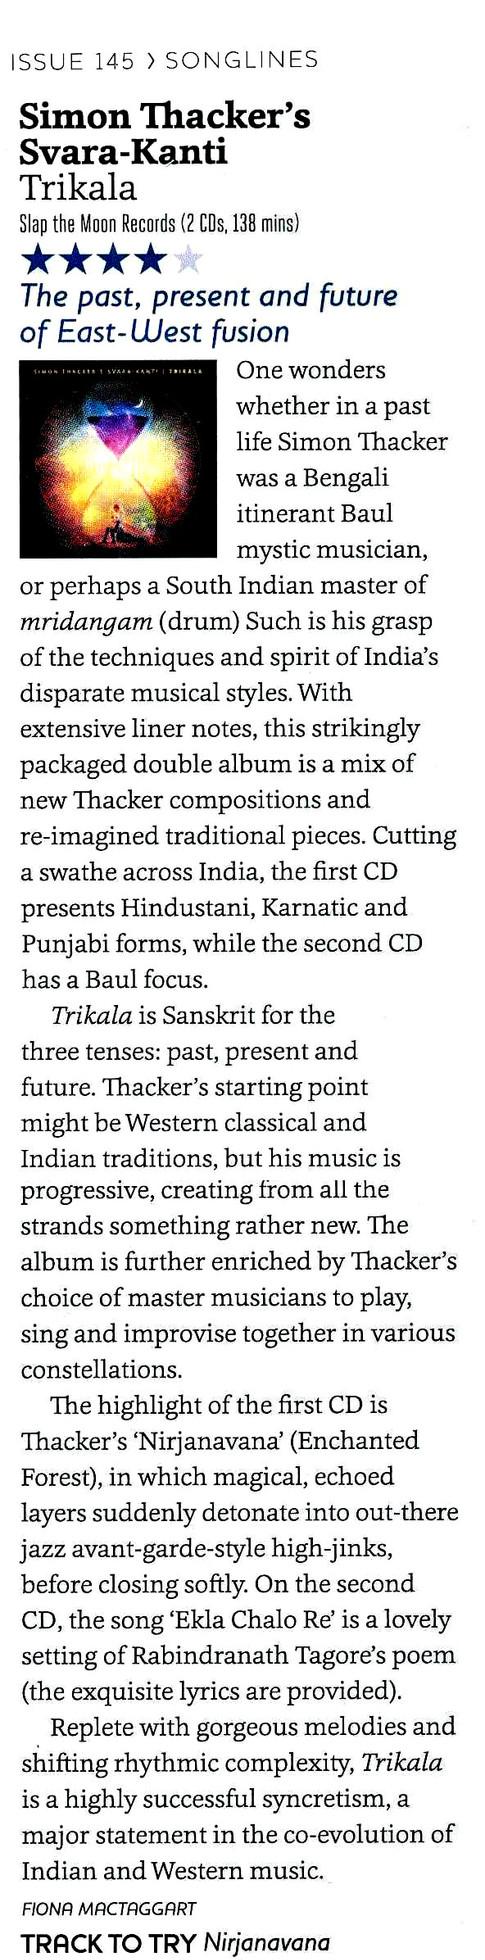 Songlines Trikala Review, Simon Thacker'